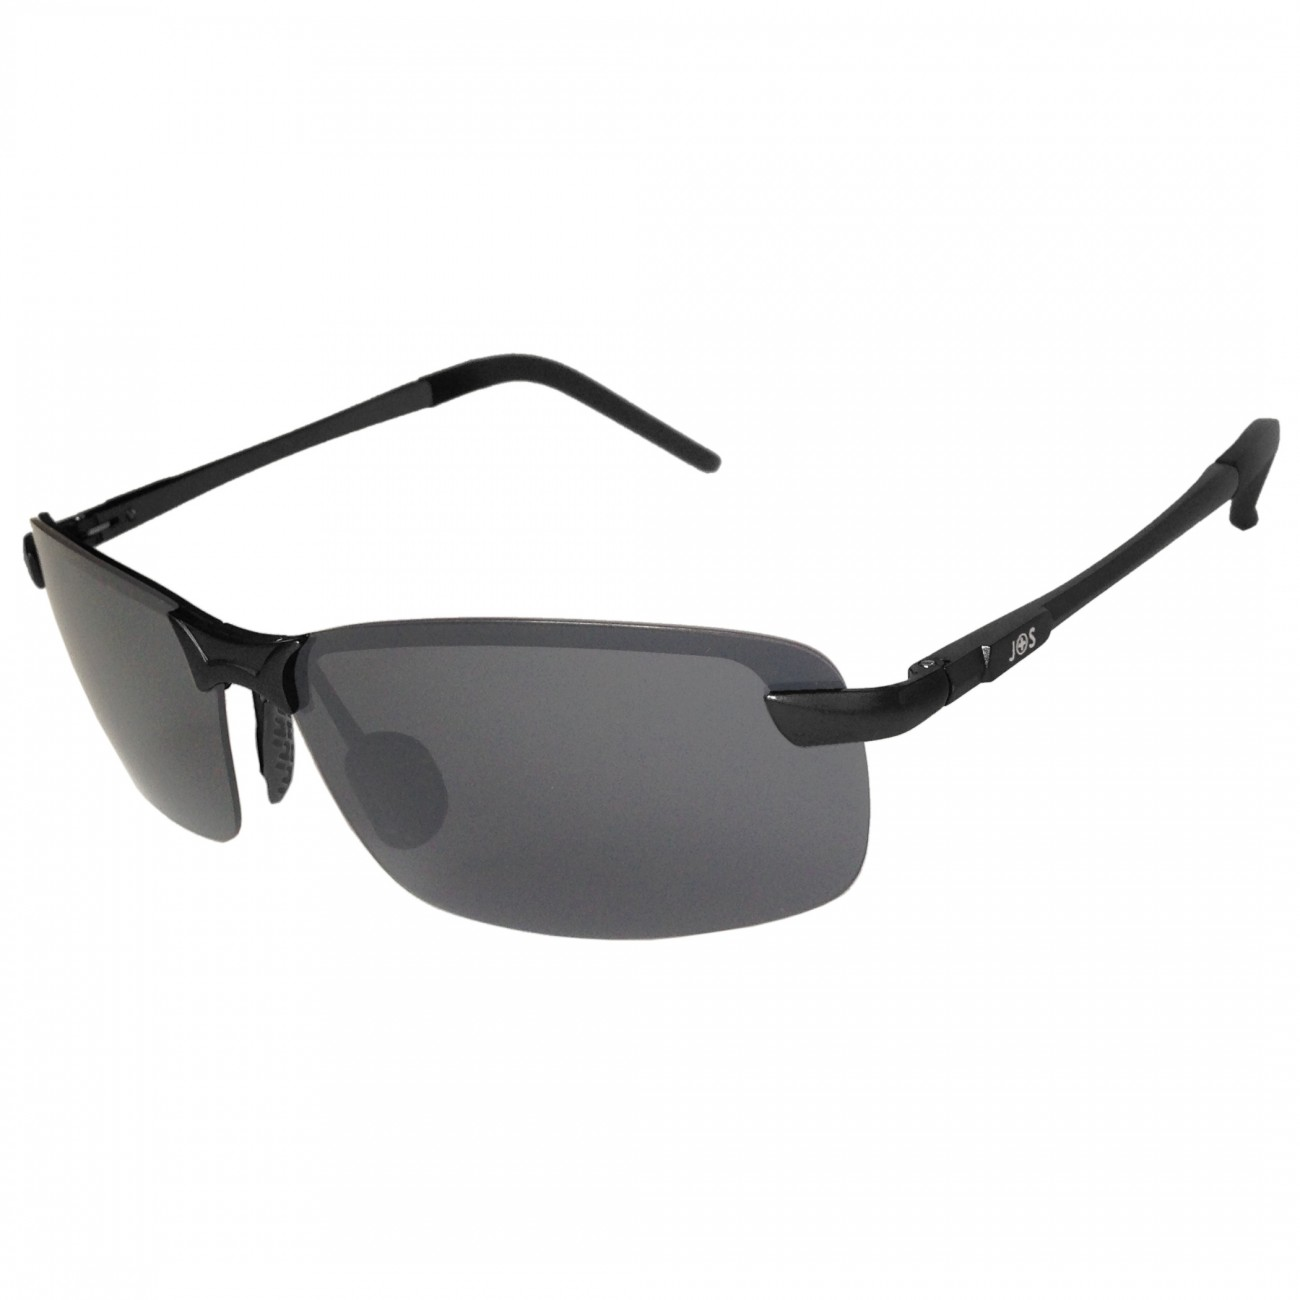 Mens Sunglasses Polarized  j s ultra lightweight men s rimless sports sunglasses polarized